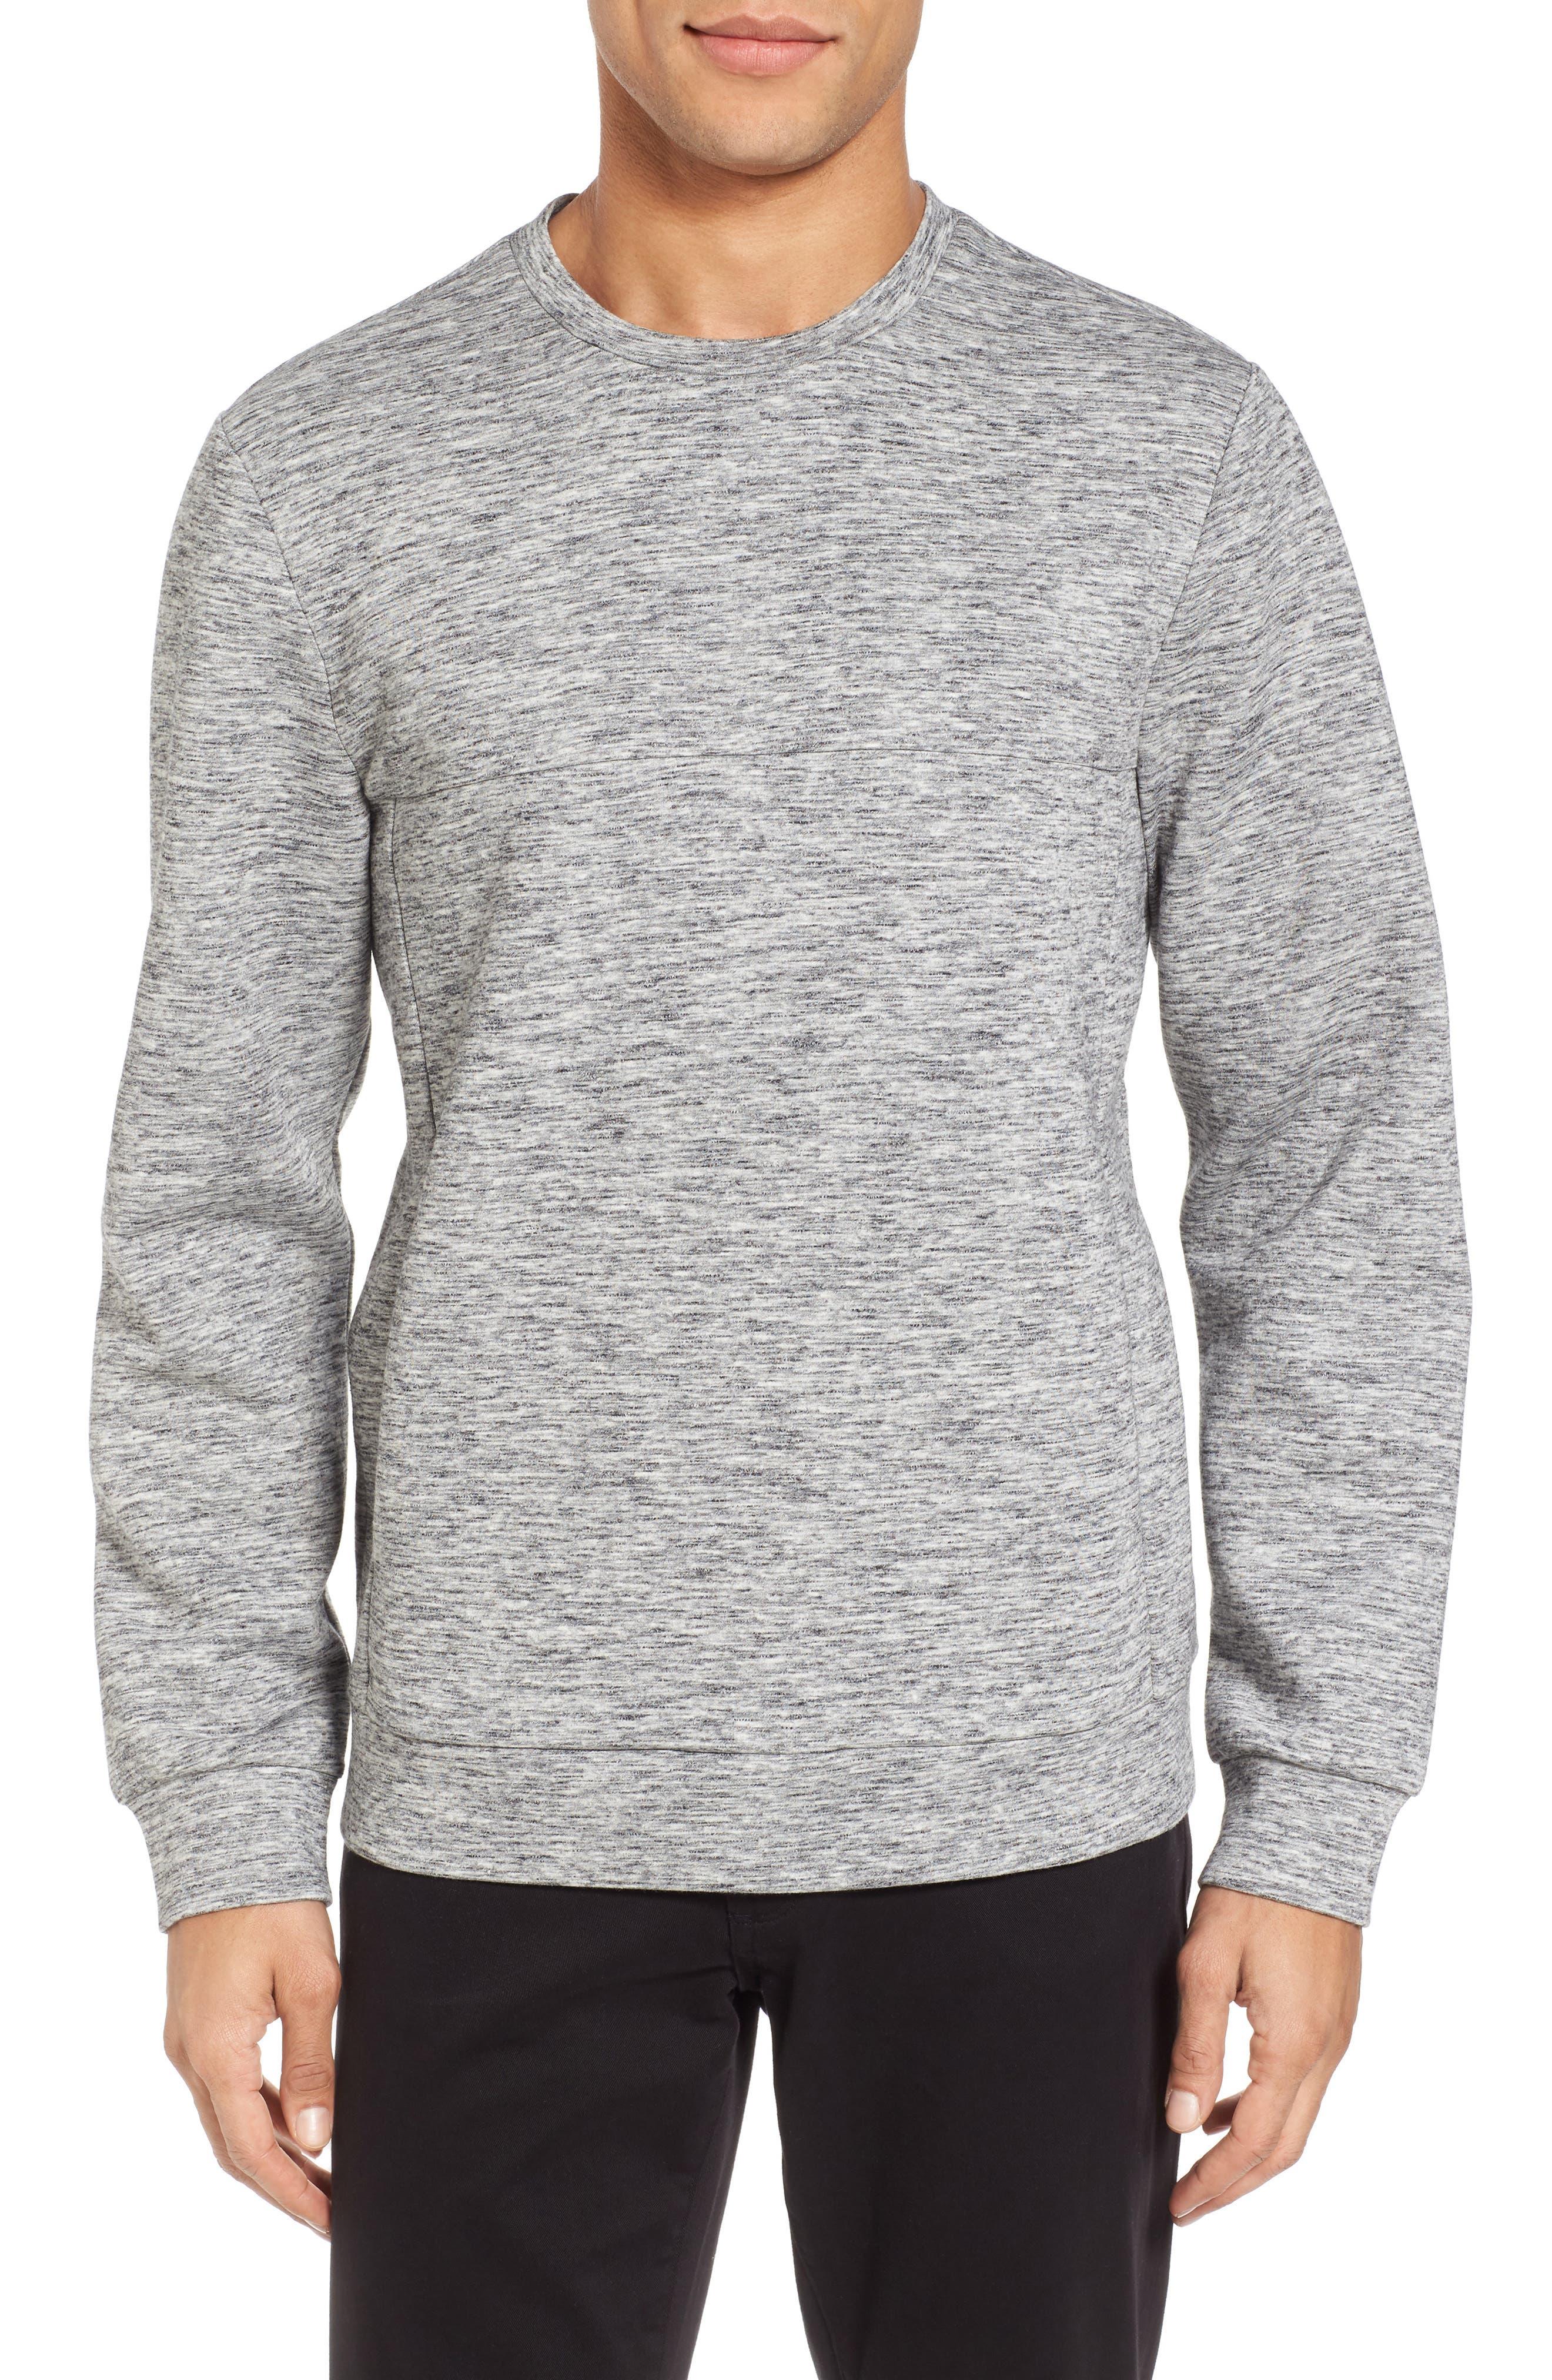 Space Dyed Sweatshirt,                             Main thumbnail 1, color,                             030